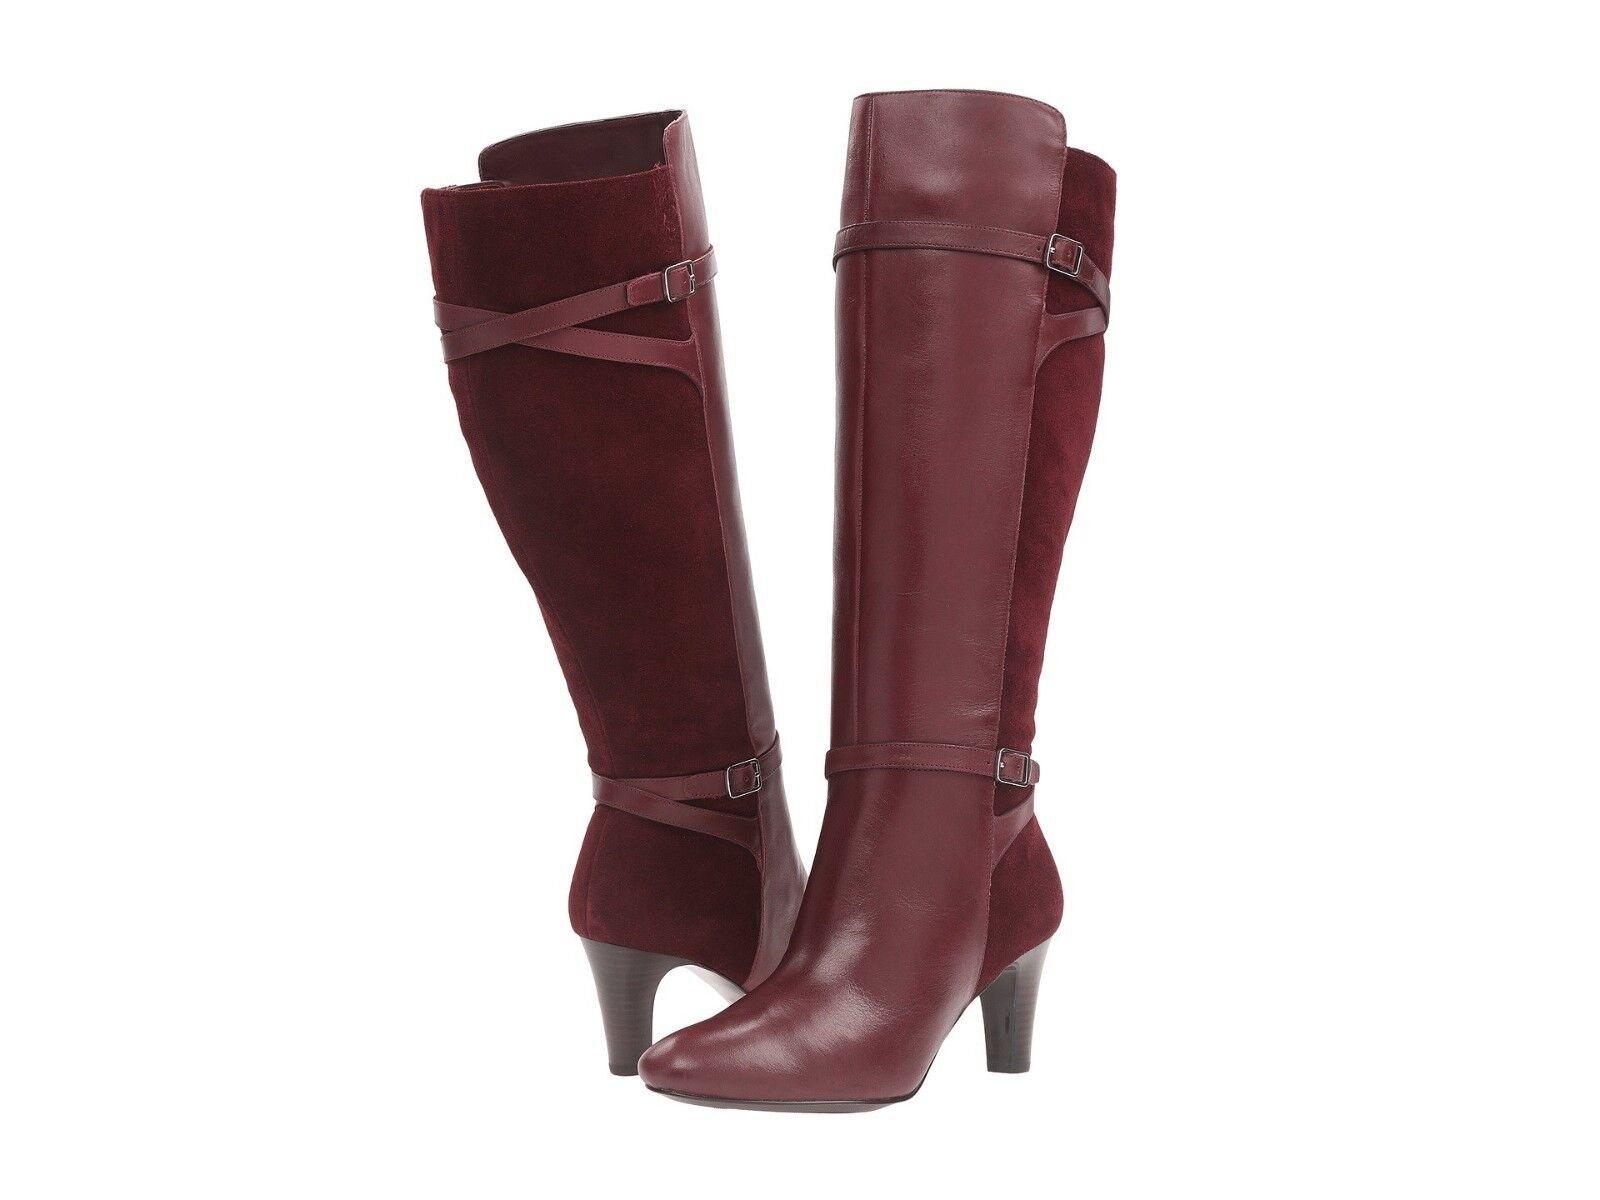 ultimi stili Ralph Lauren Lauren Lauren Donna  stivali Sabeen Wide Calf High Heels Dress stivali  nuovo di marca